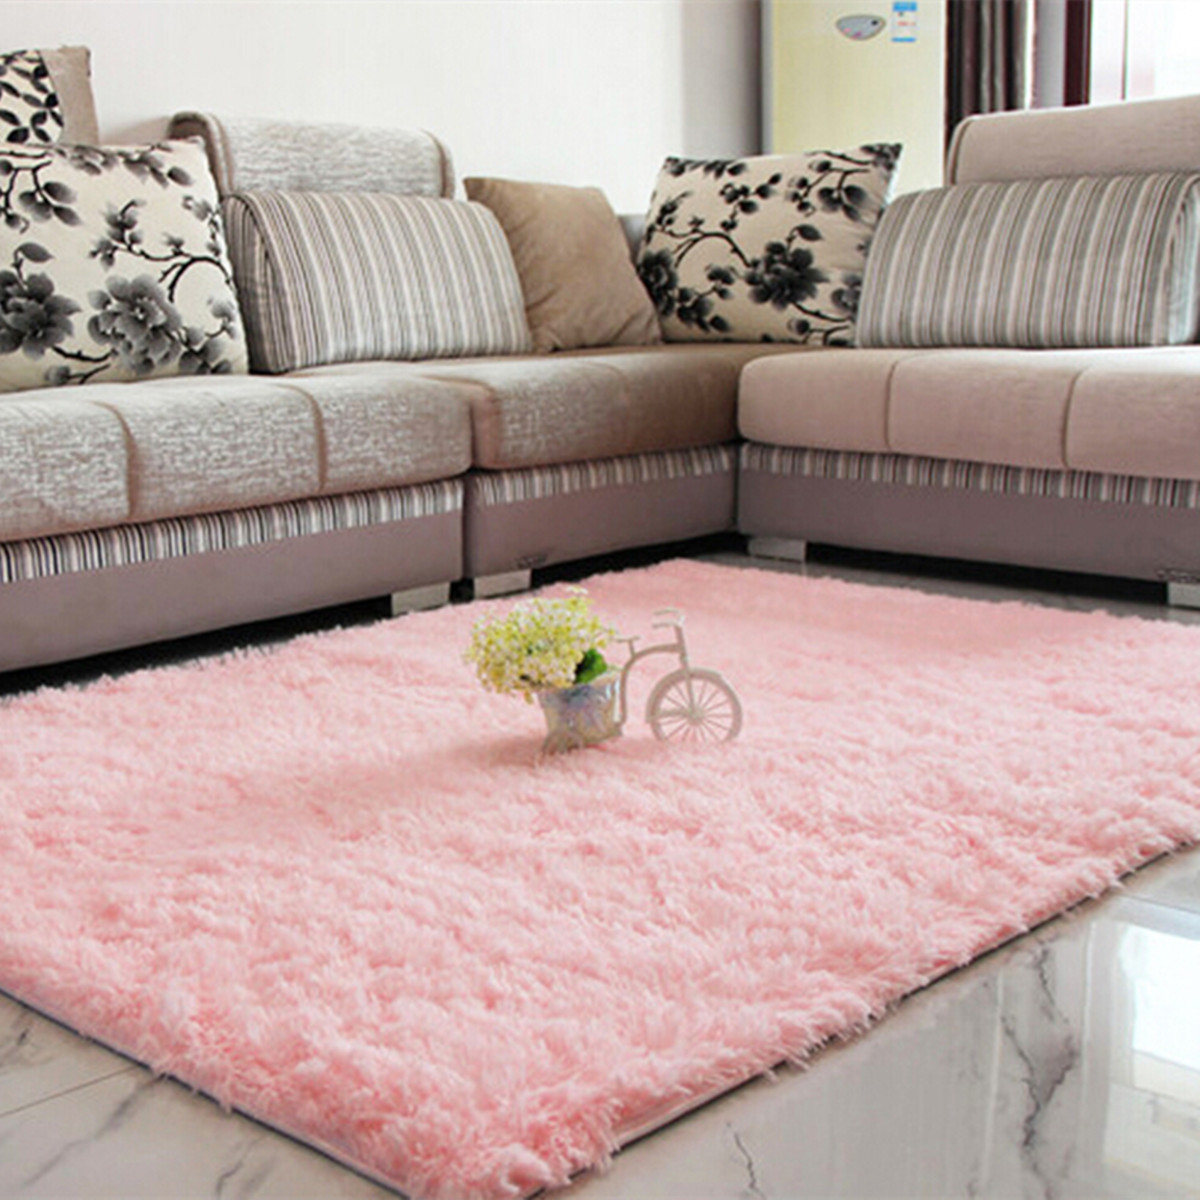 Fluffy Shaggy Area Rug Dining Carpet Comfy Floor Mat 80X50CM 7Color. Source .